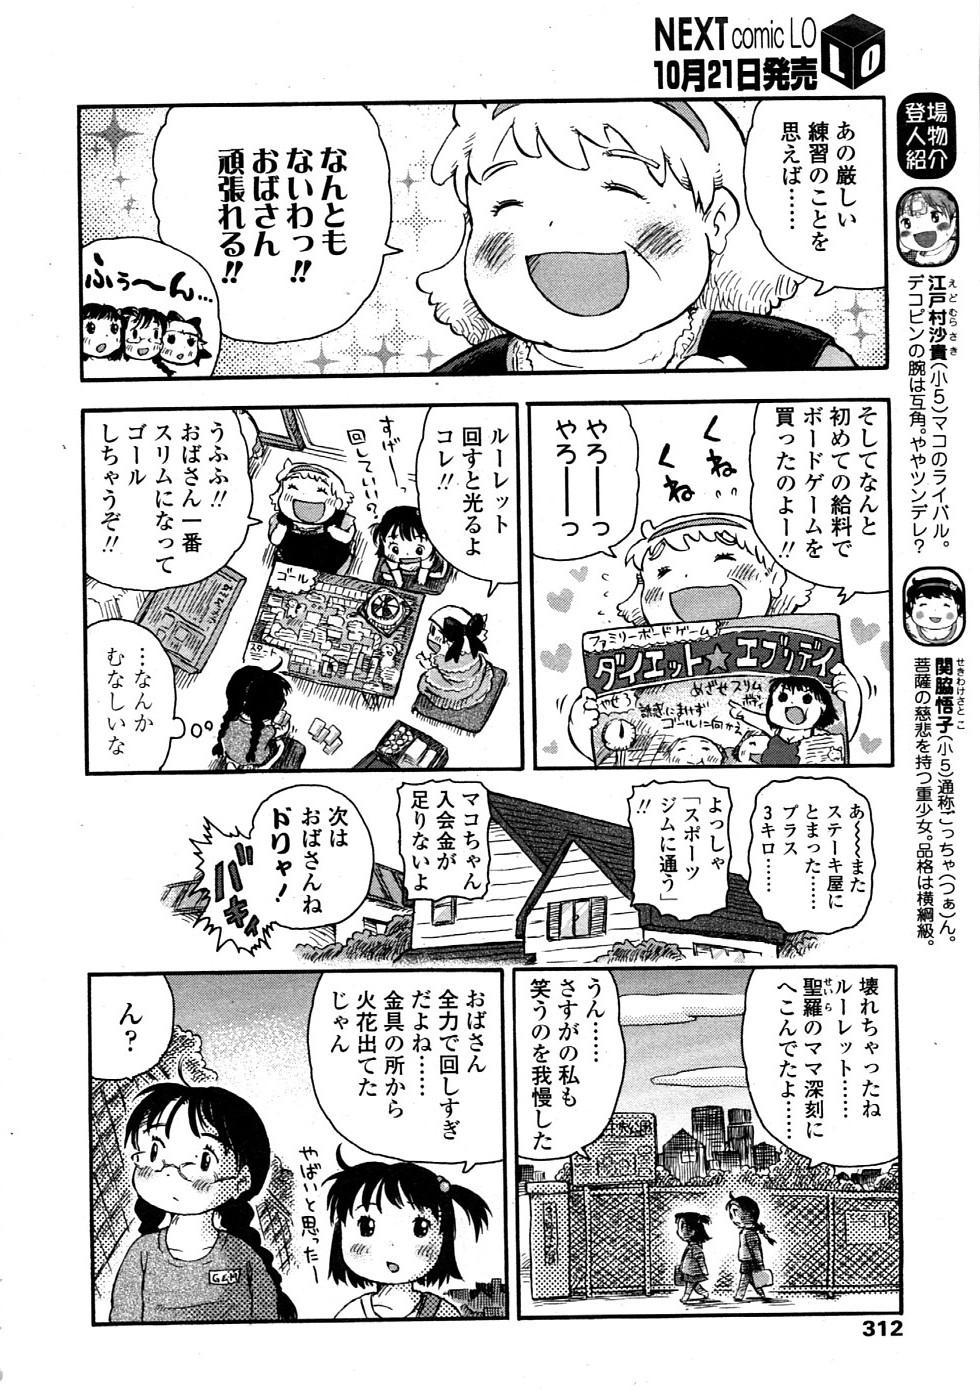 Comic LO 2008-11 Vol. 56 311